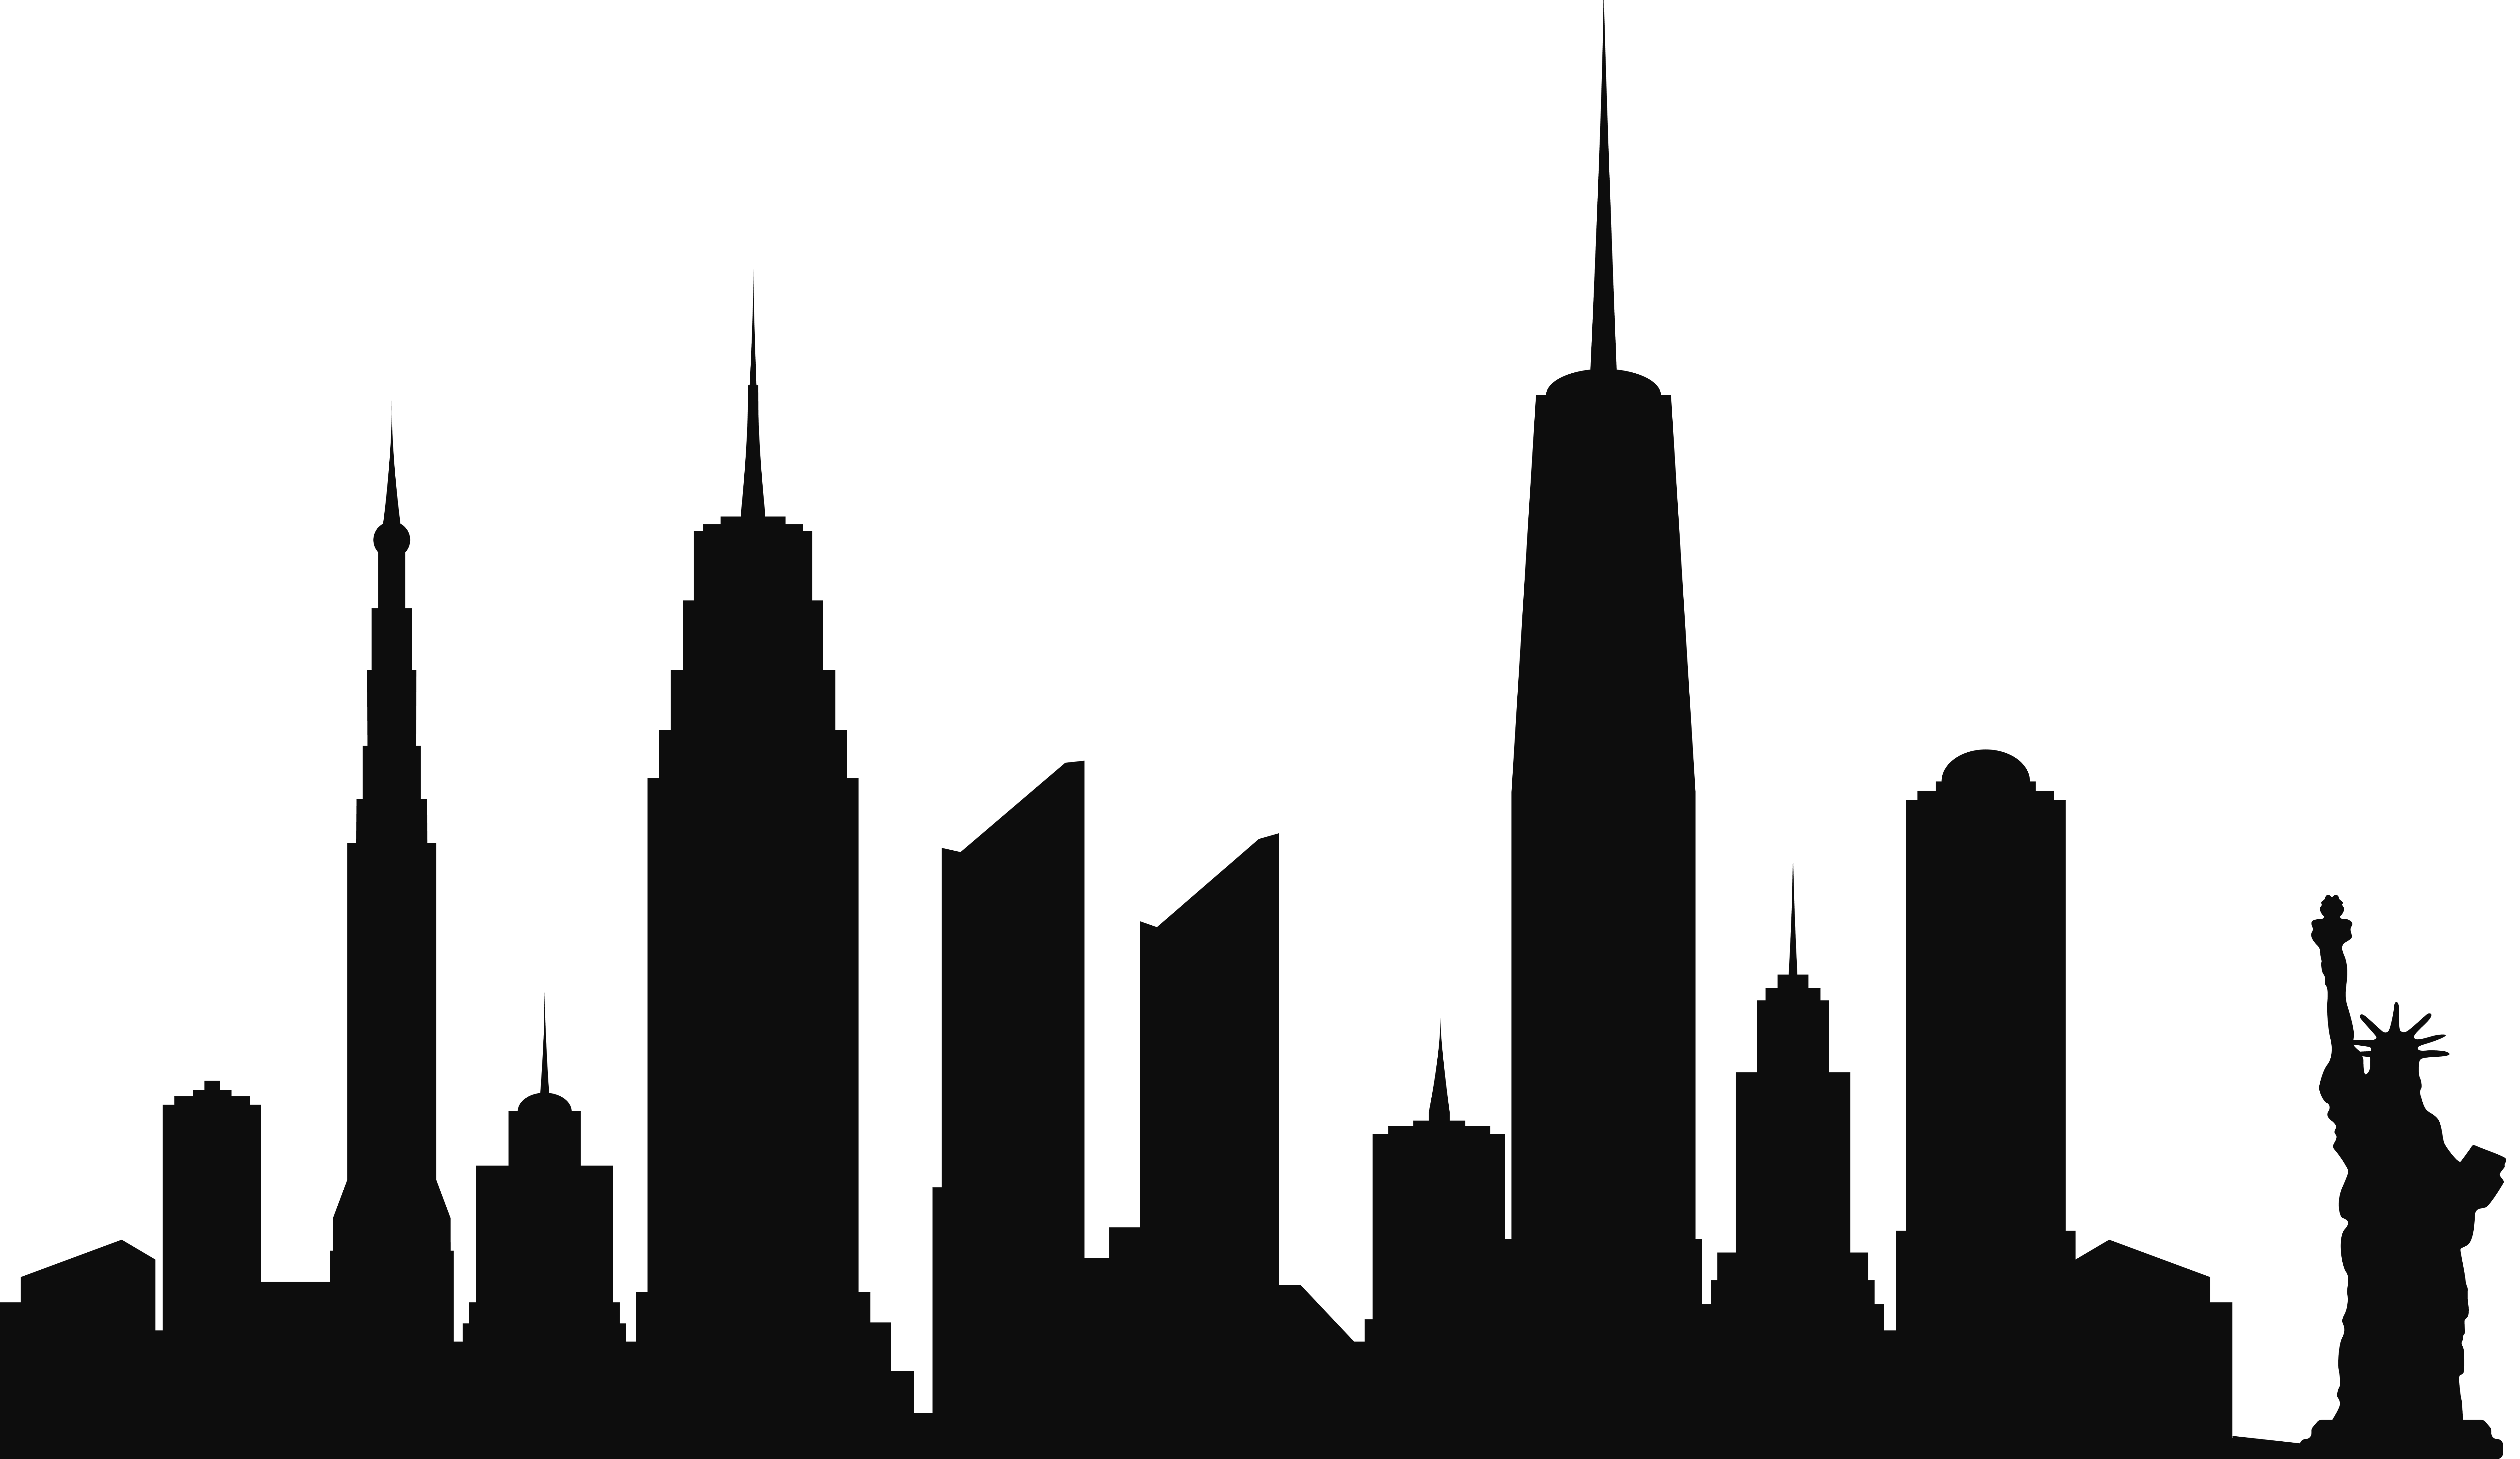 new york skyline silhouette clip art at getdrawings com free for rh getdrawings com nyc skyline clip art black and white nyc skyline silhouette clipart